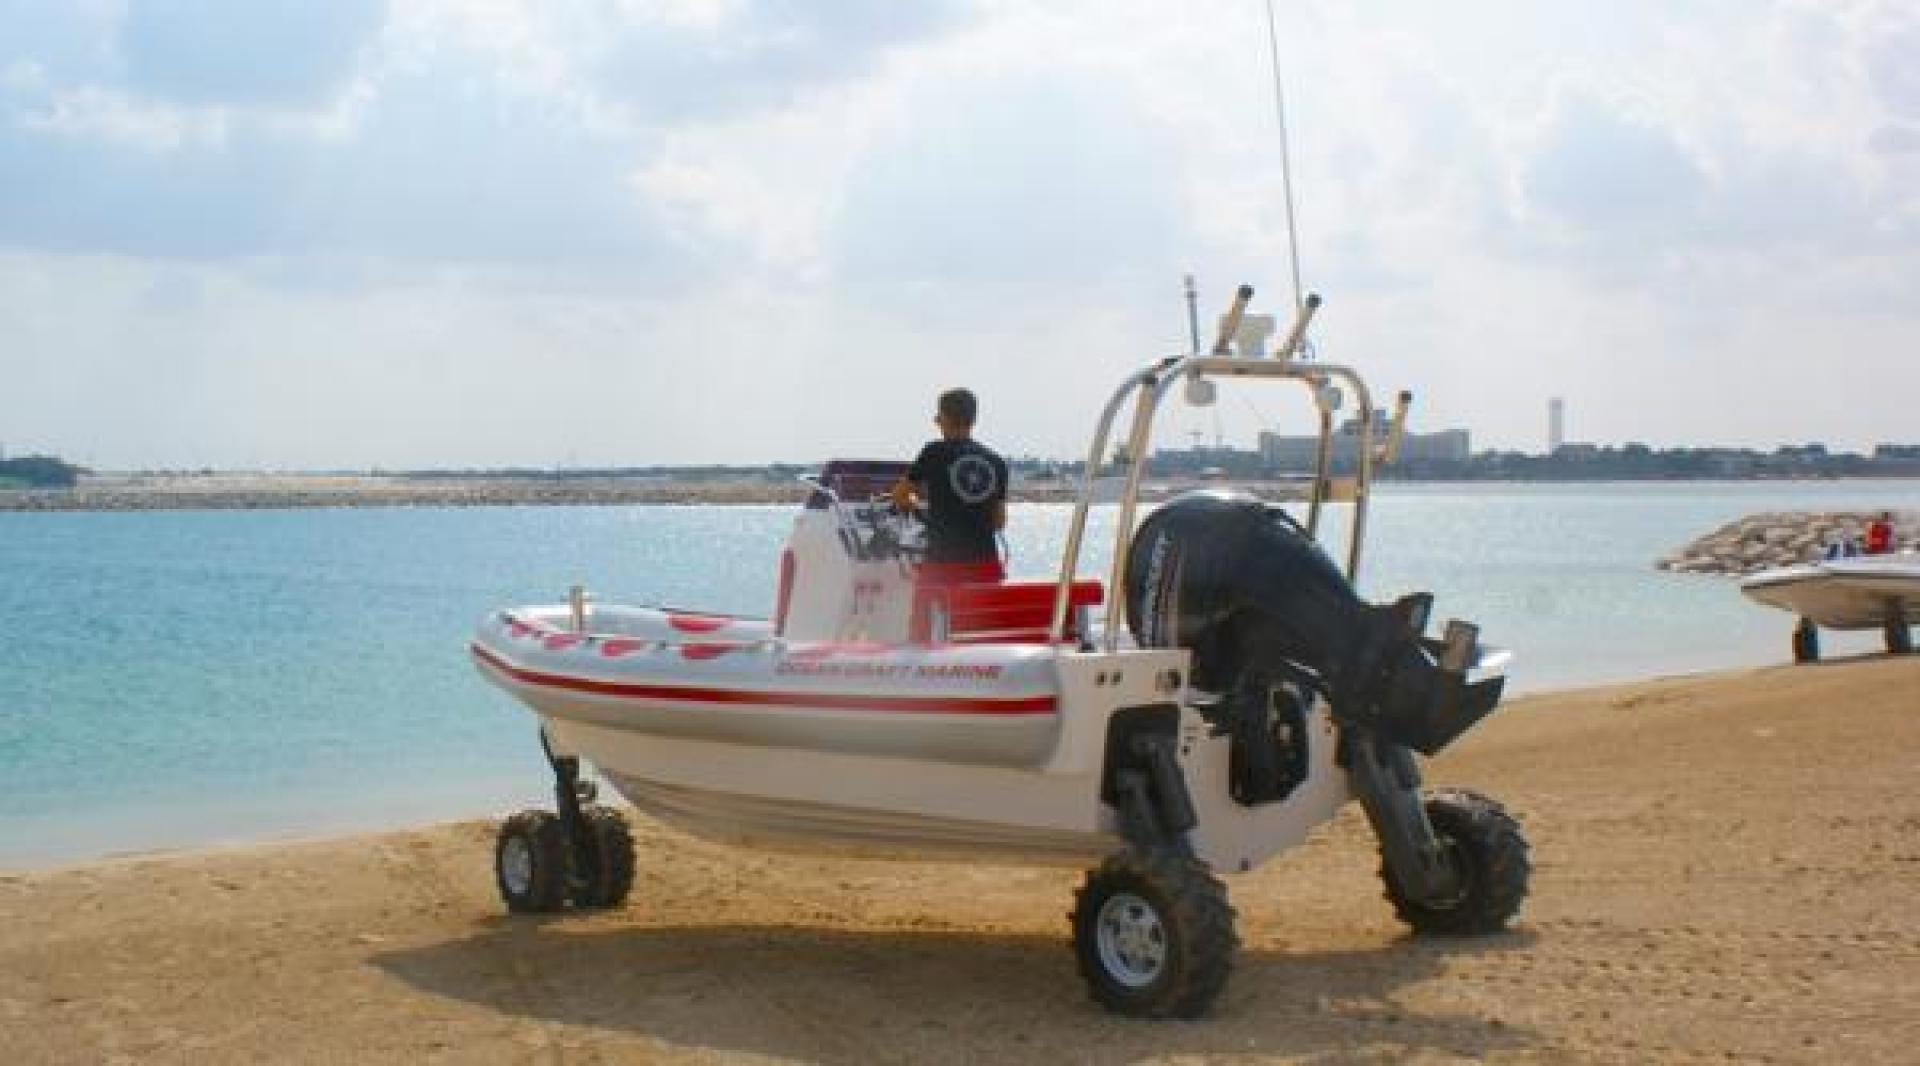 Ocean Craft Marine-7.1 M Amphibious 2021-Ocean Craft Marine 7.1 M Amphibious Fort Lauderdale-Florida-United States-1523223 | Thumbnail